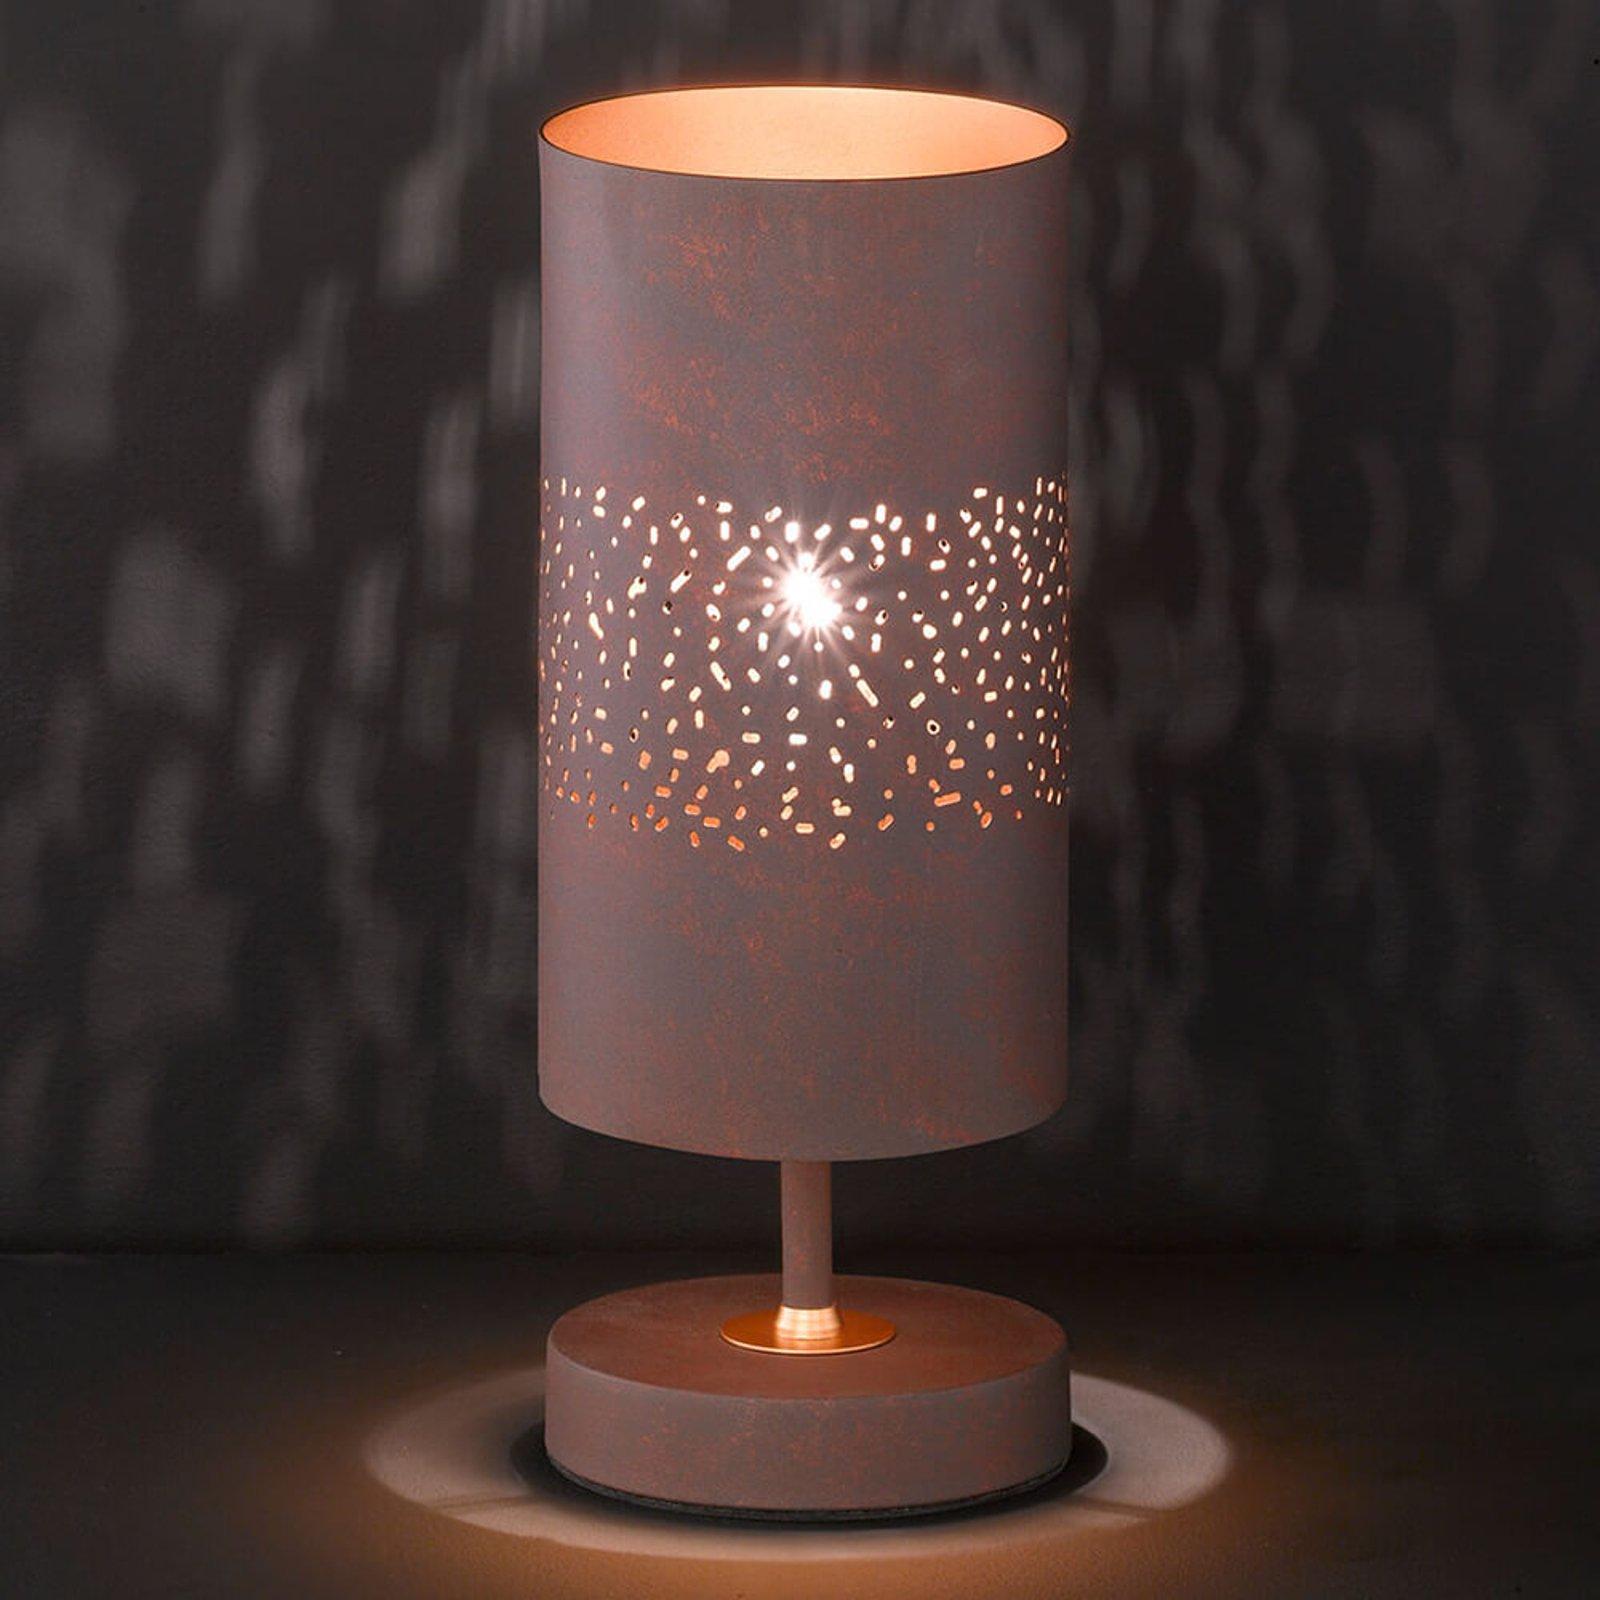 Metallbordlampe Ancona i brun antikk